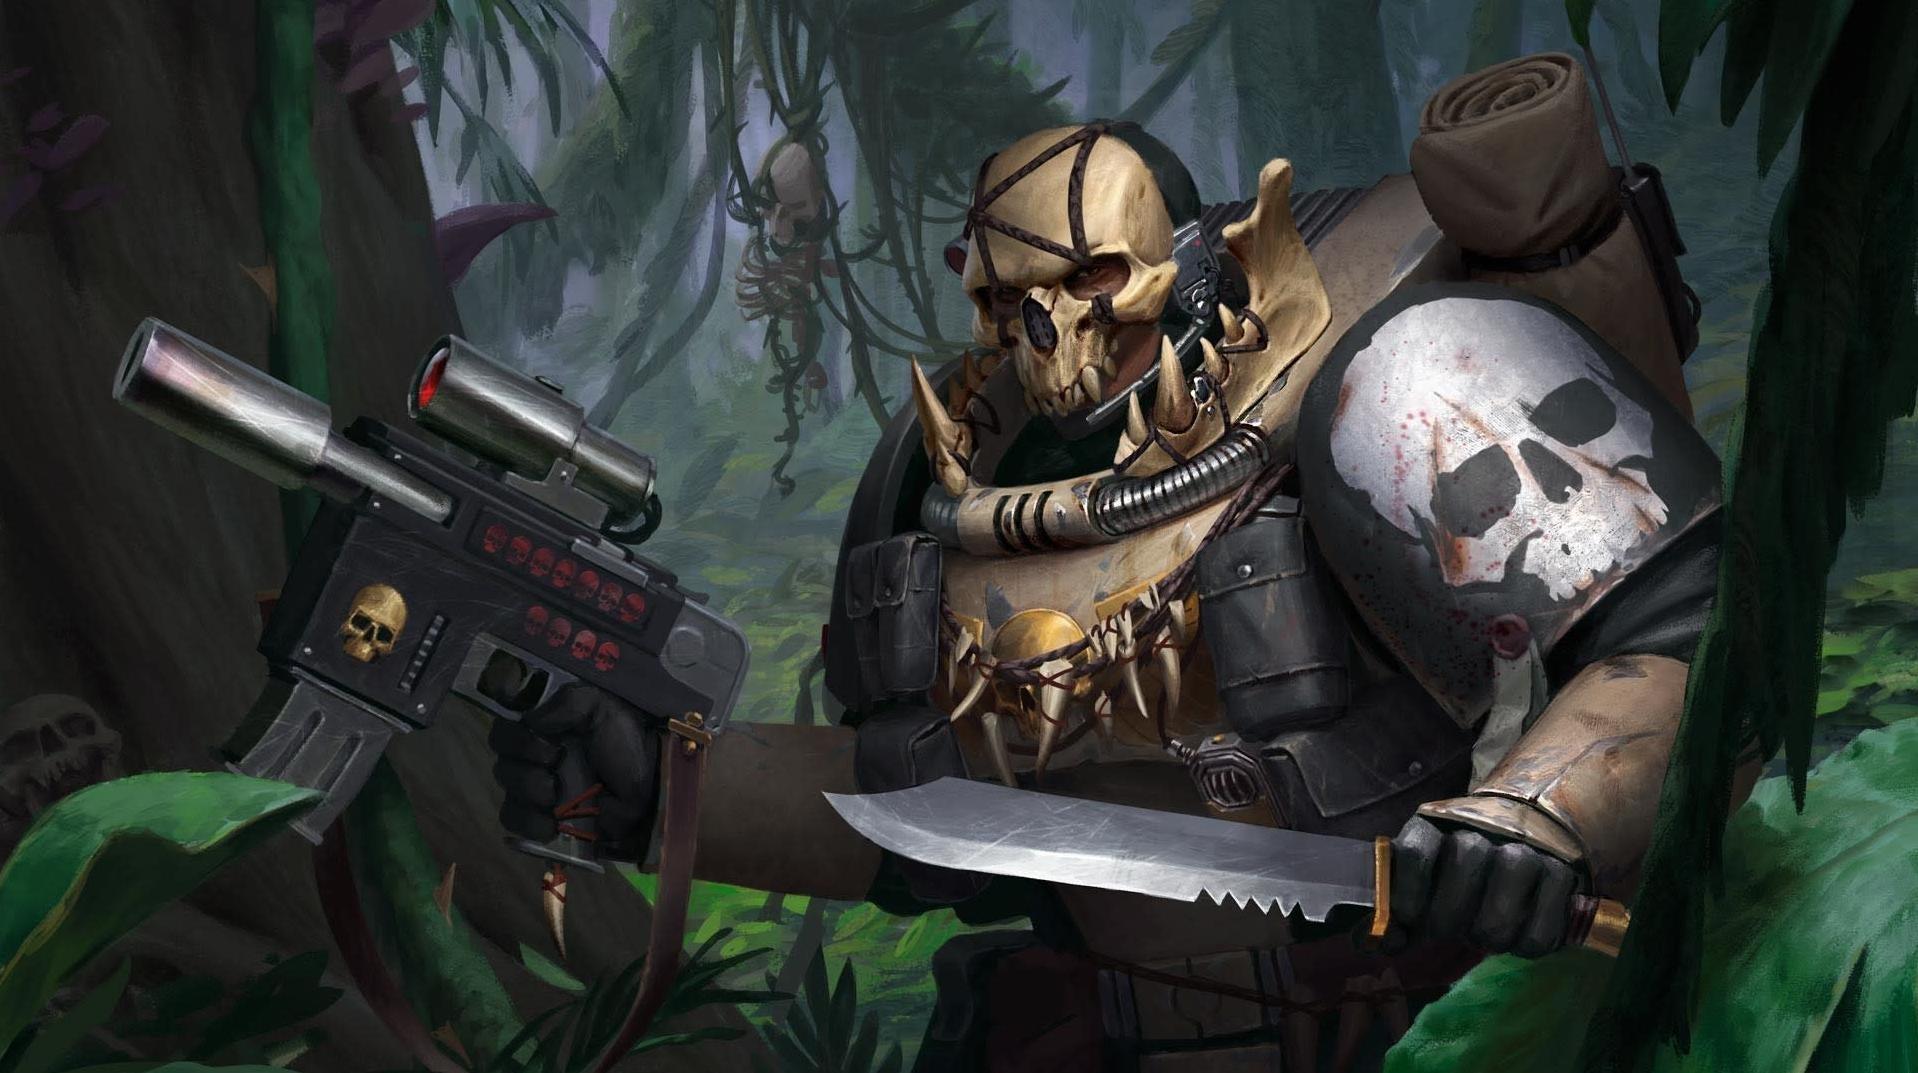 Warhammer 40K: Bone Marine